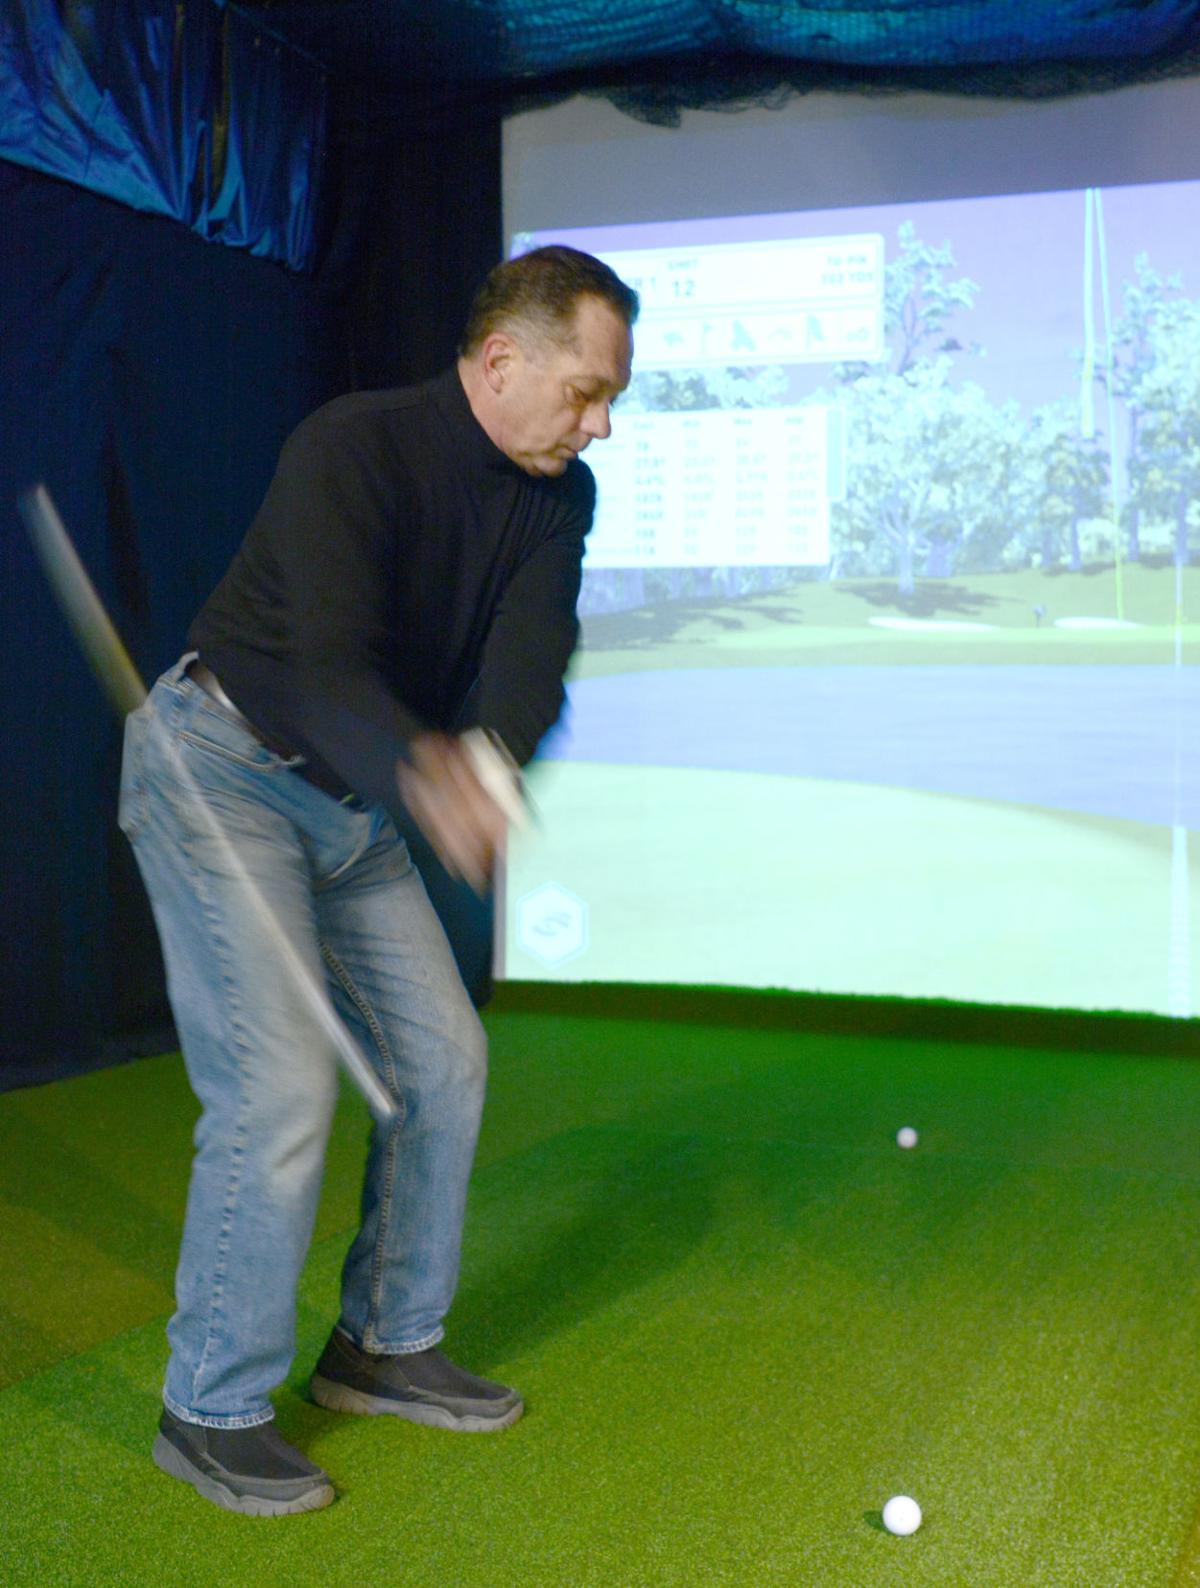 Princeton Indoor Golf